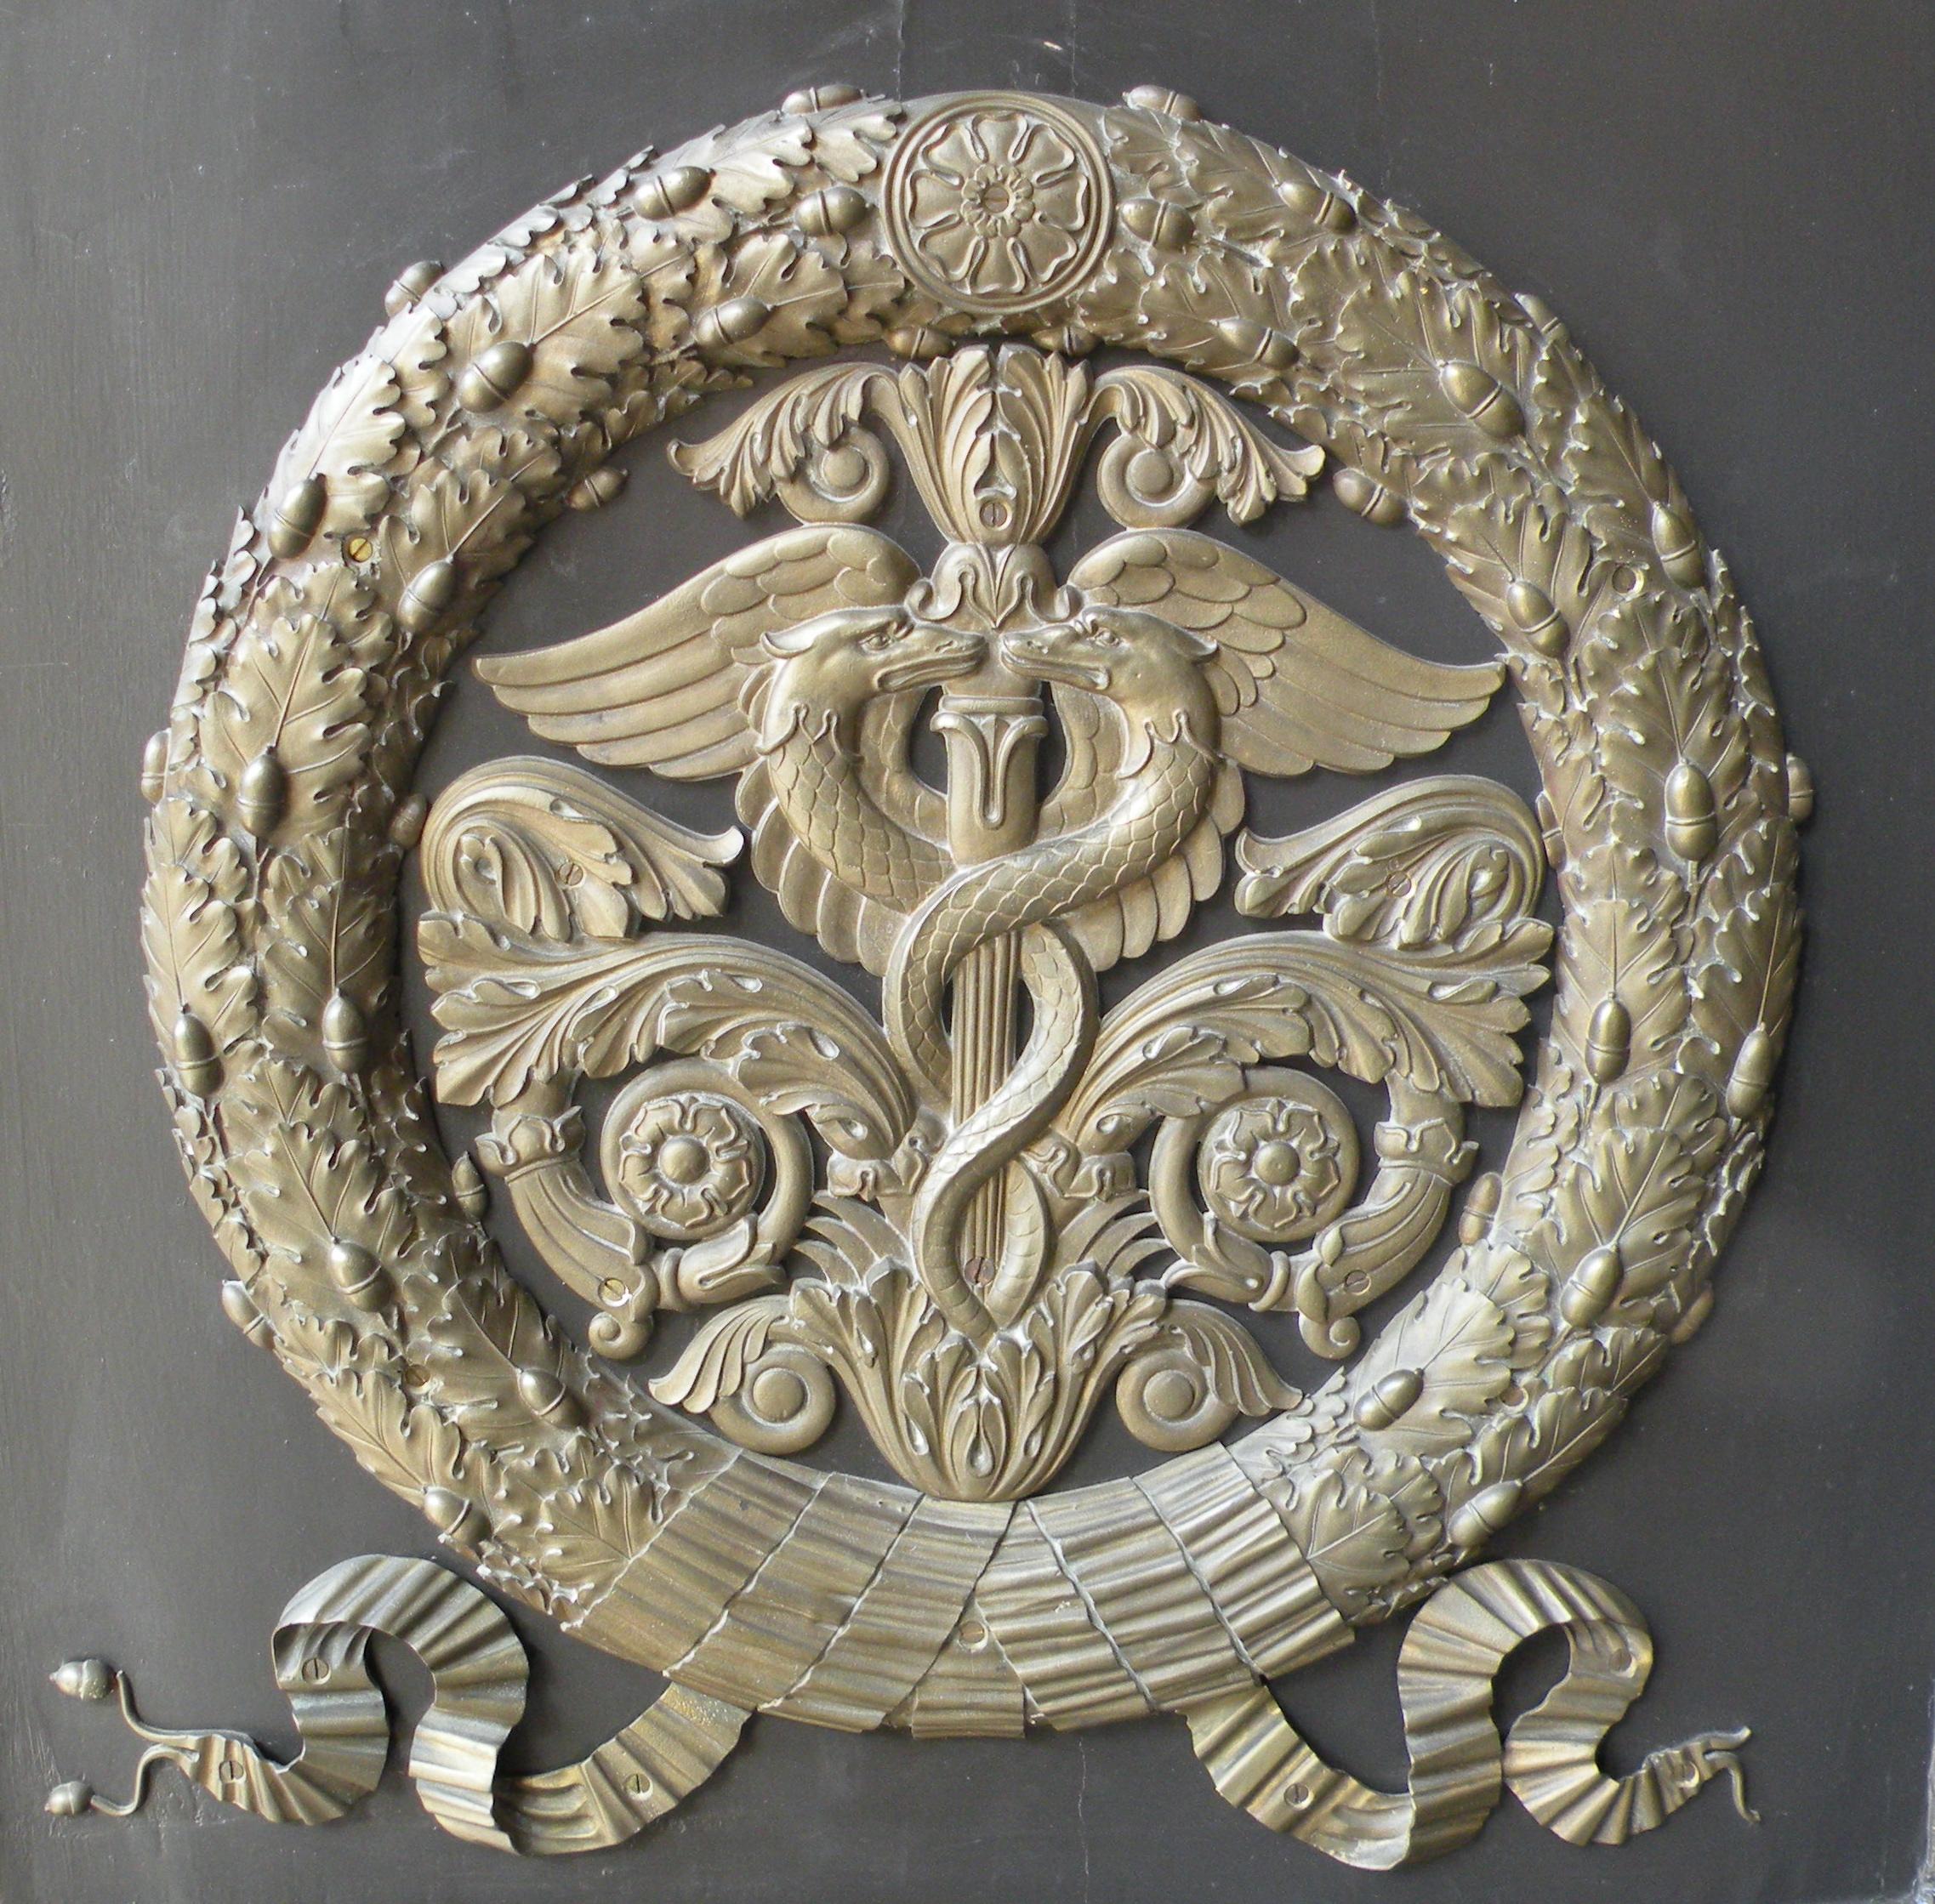 File decor porte ext salon casimir wikimedia for Plaque decorative porte